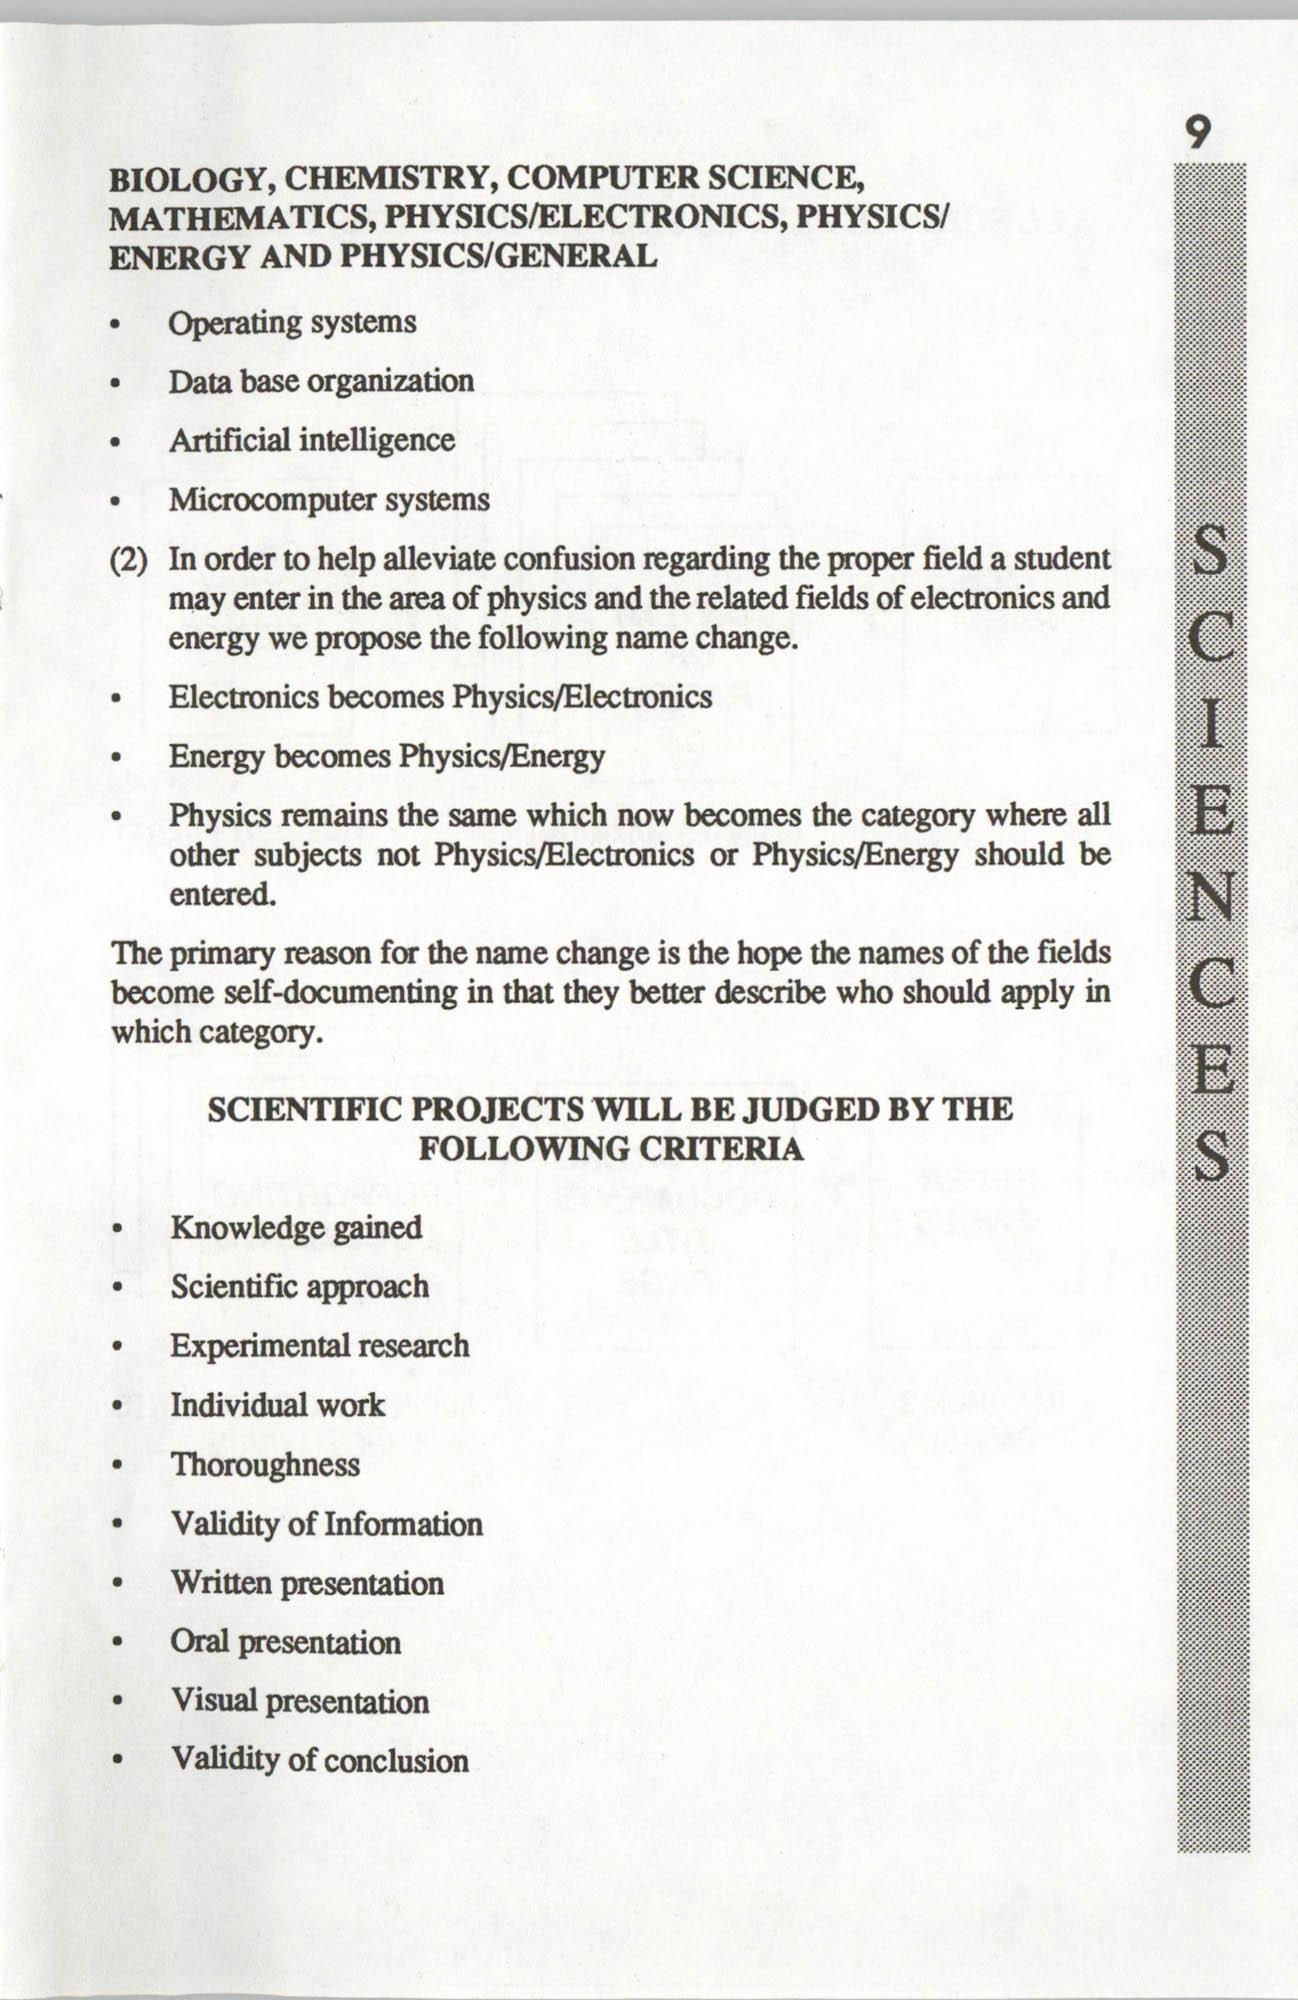 Brochure, ACT-SO Program, NAACP, 1992, Page 9